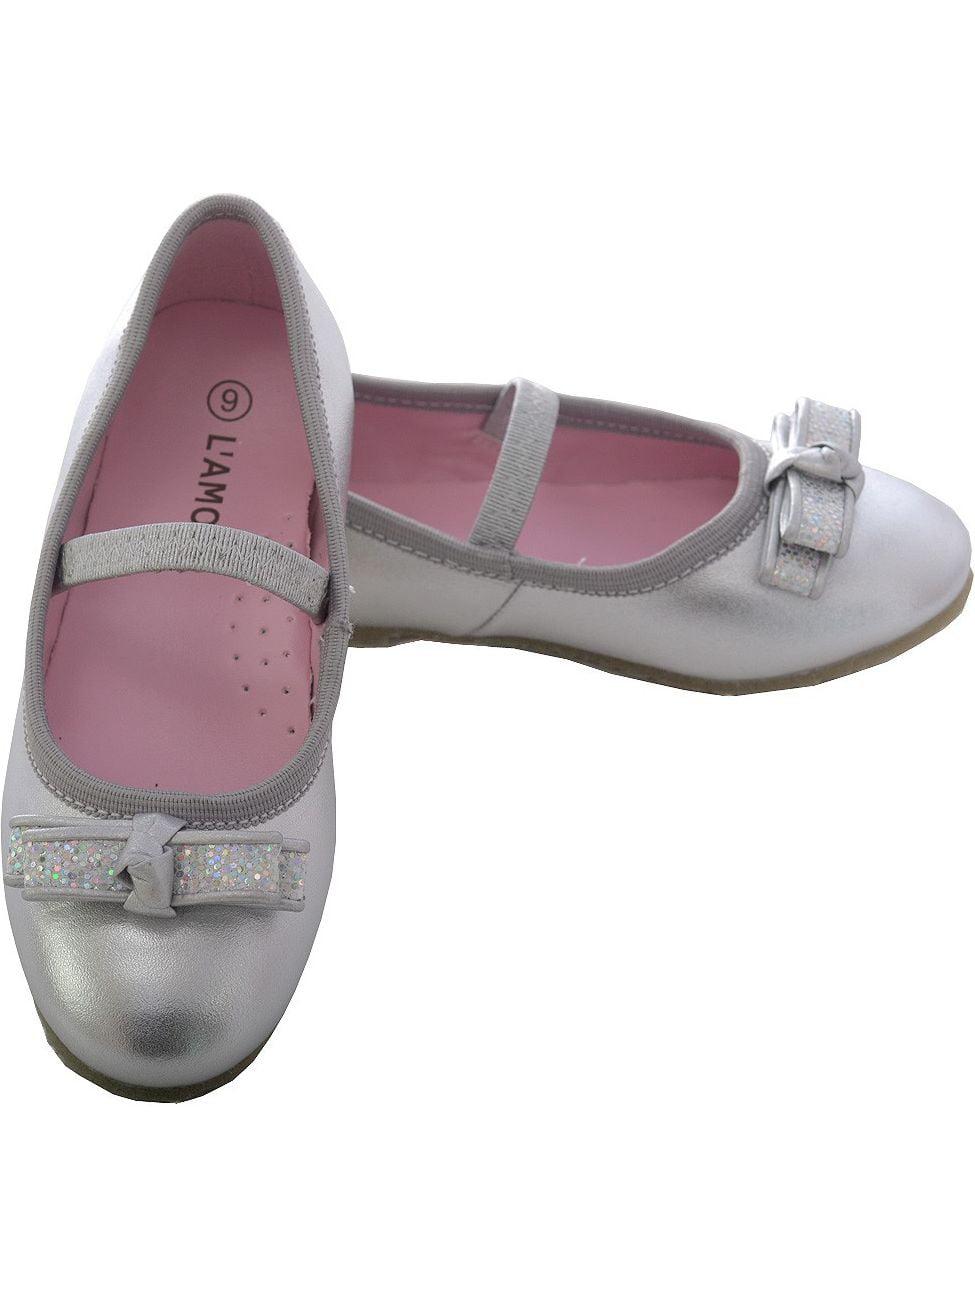 Silver Sparkle Bow Ballet Flat Shoe Toddler Girl 5-10